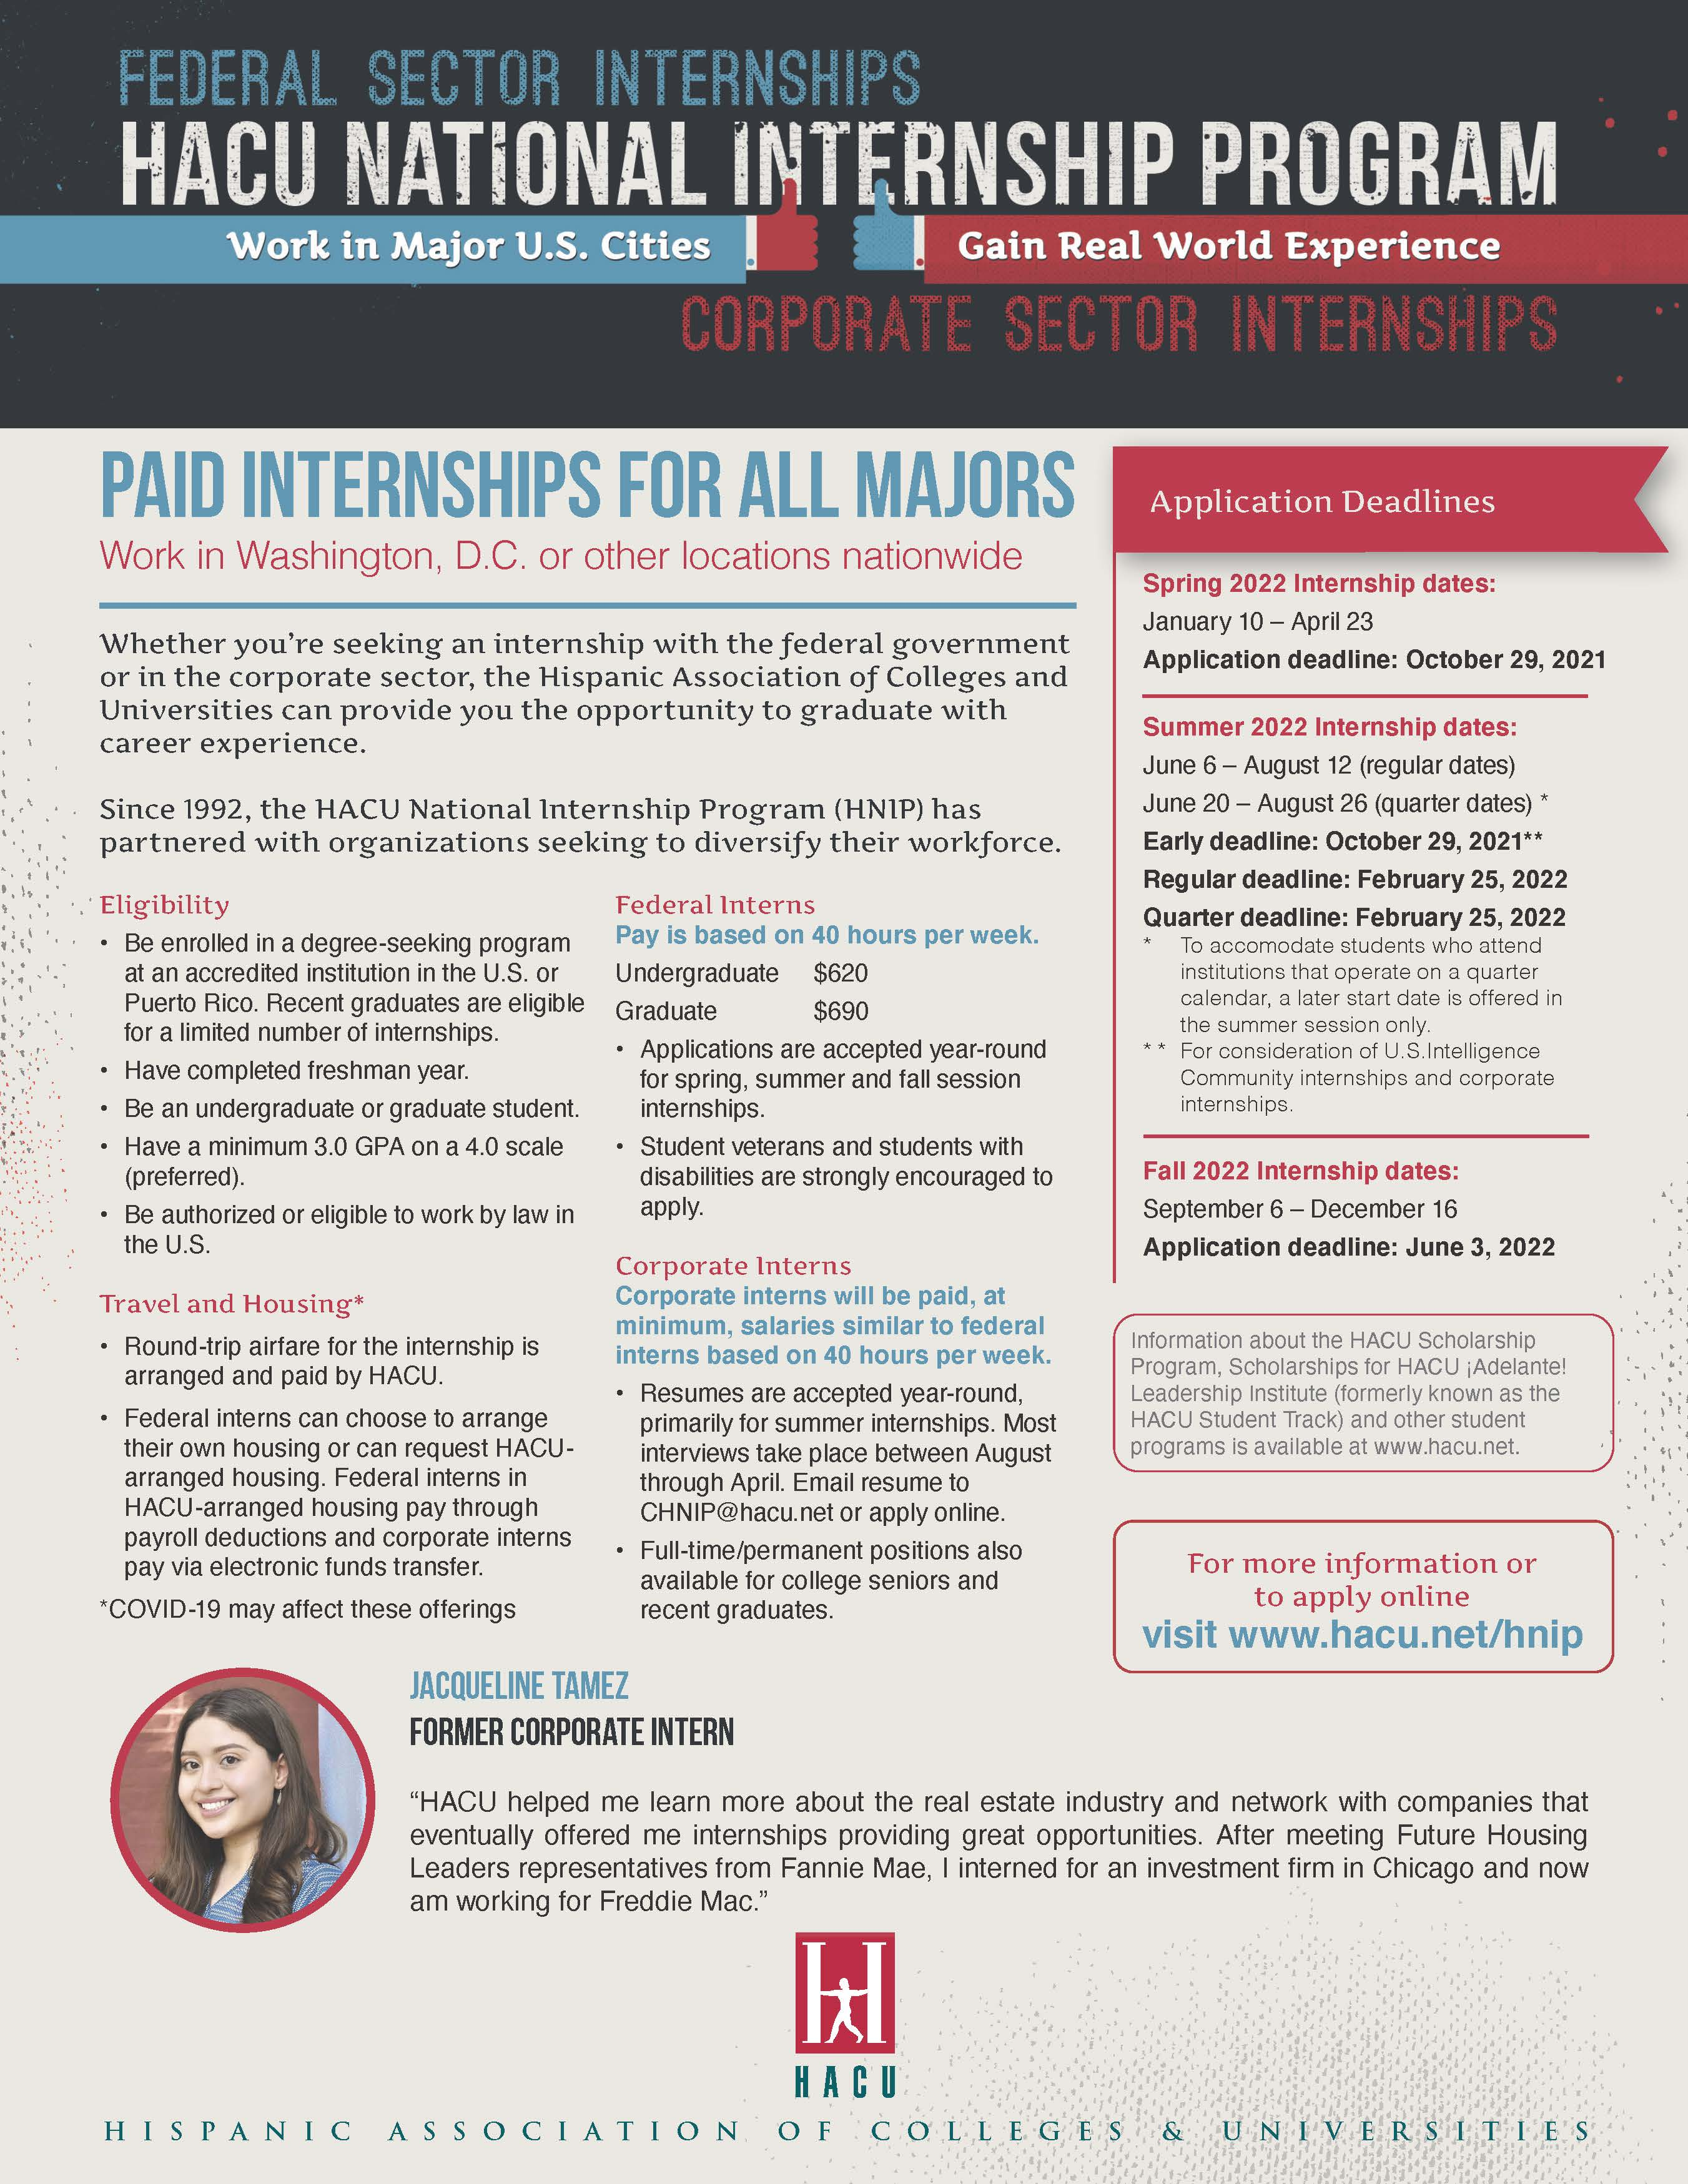 HACU National Internship Program(1)